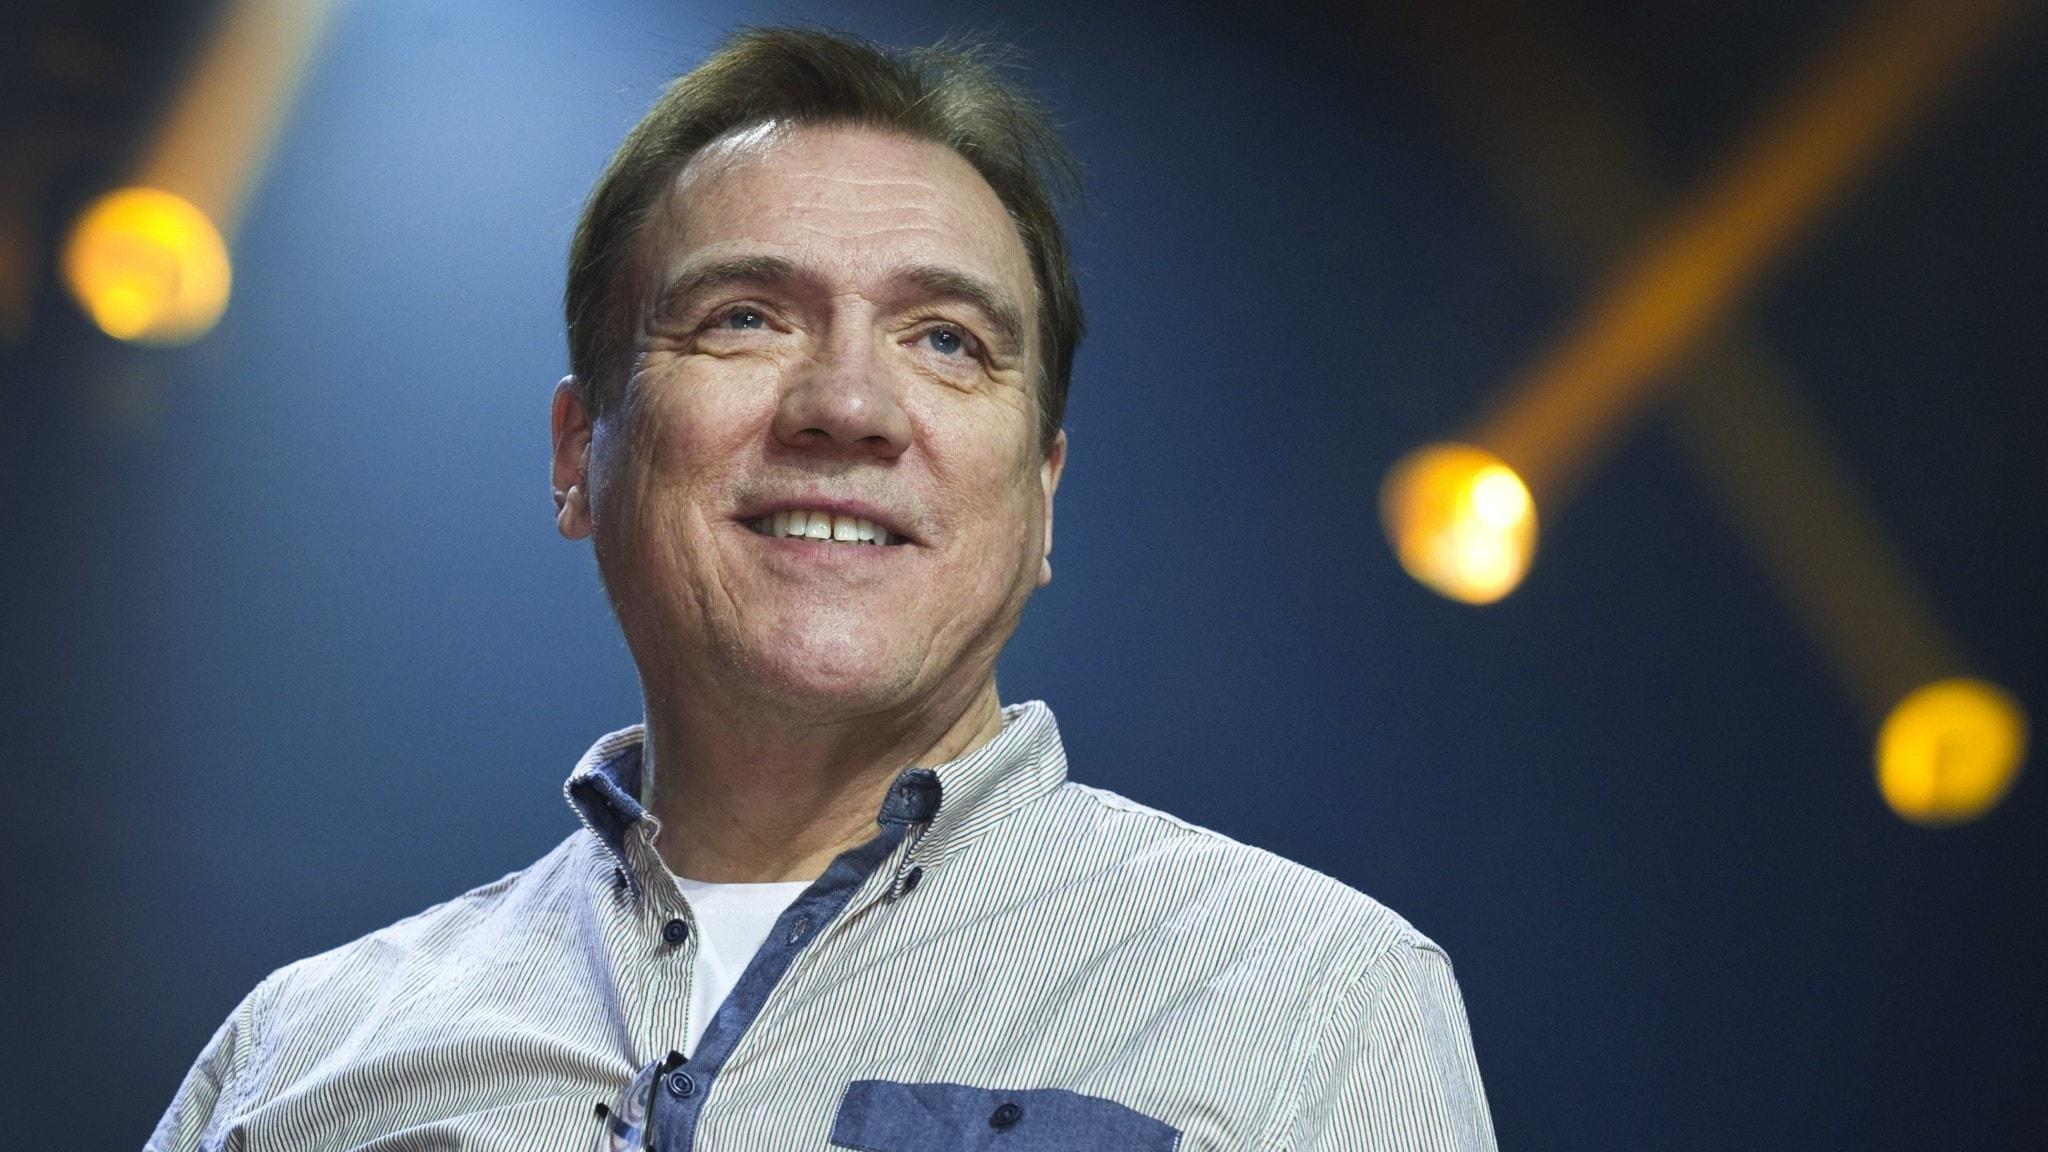 Christer Sjögren